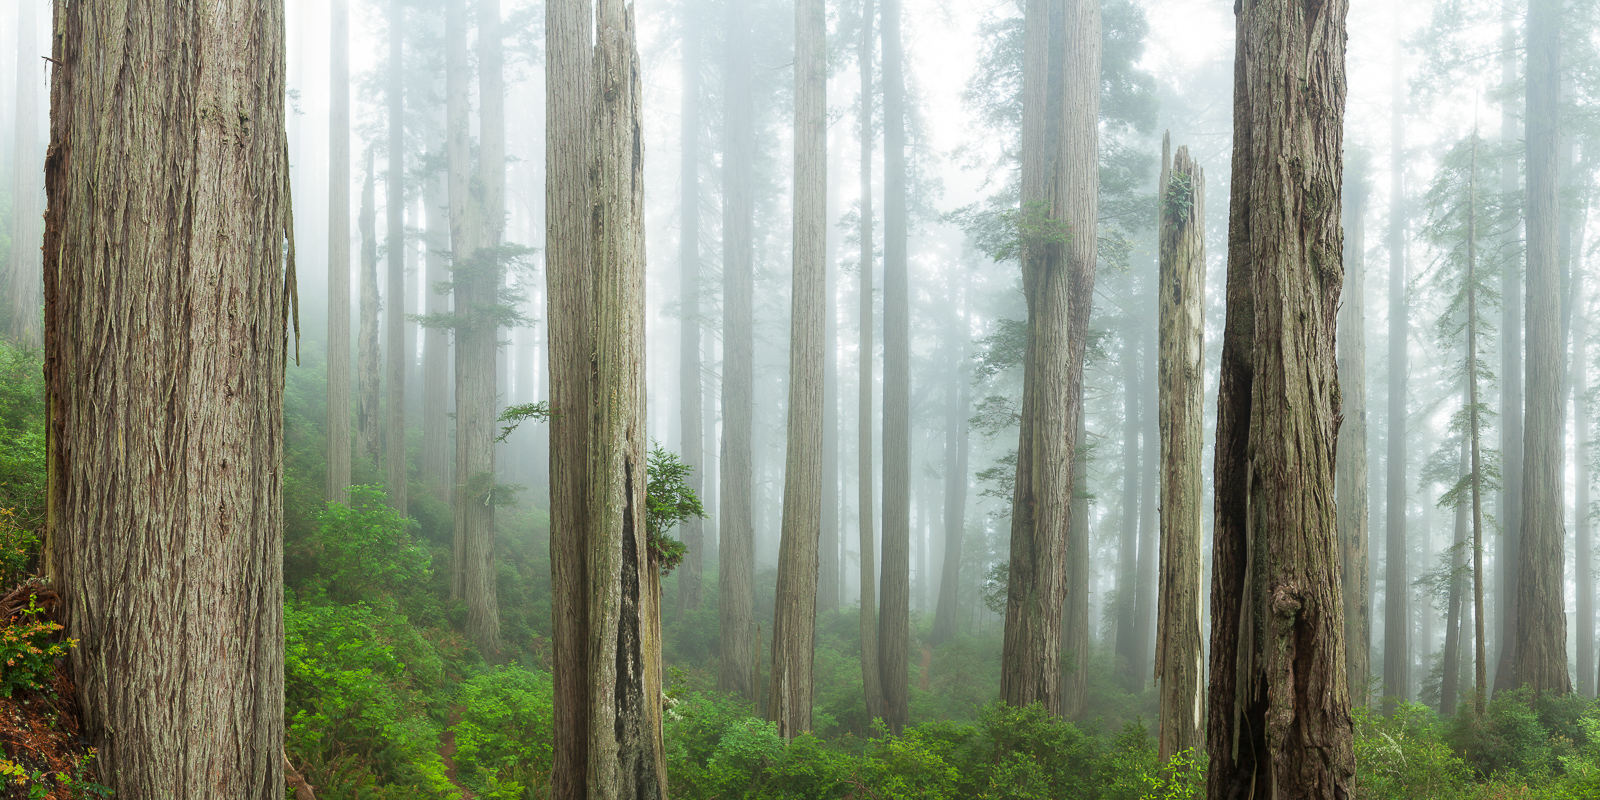 Among Redwoods,Redwoods, Trees, Del Norte Coast Redwoods State Park,Ocean,Trees, photo